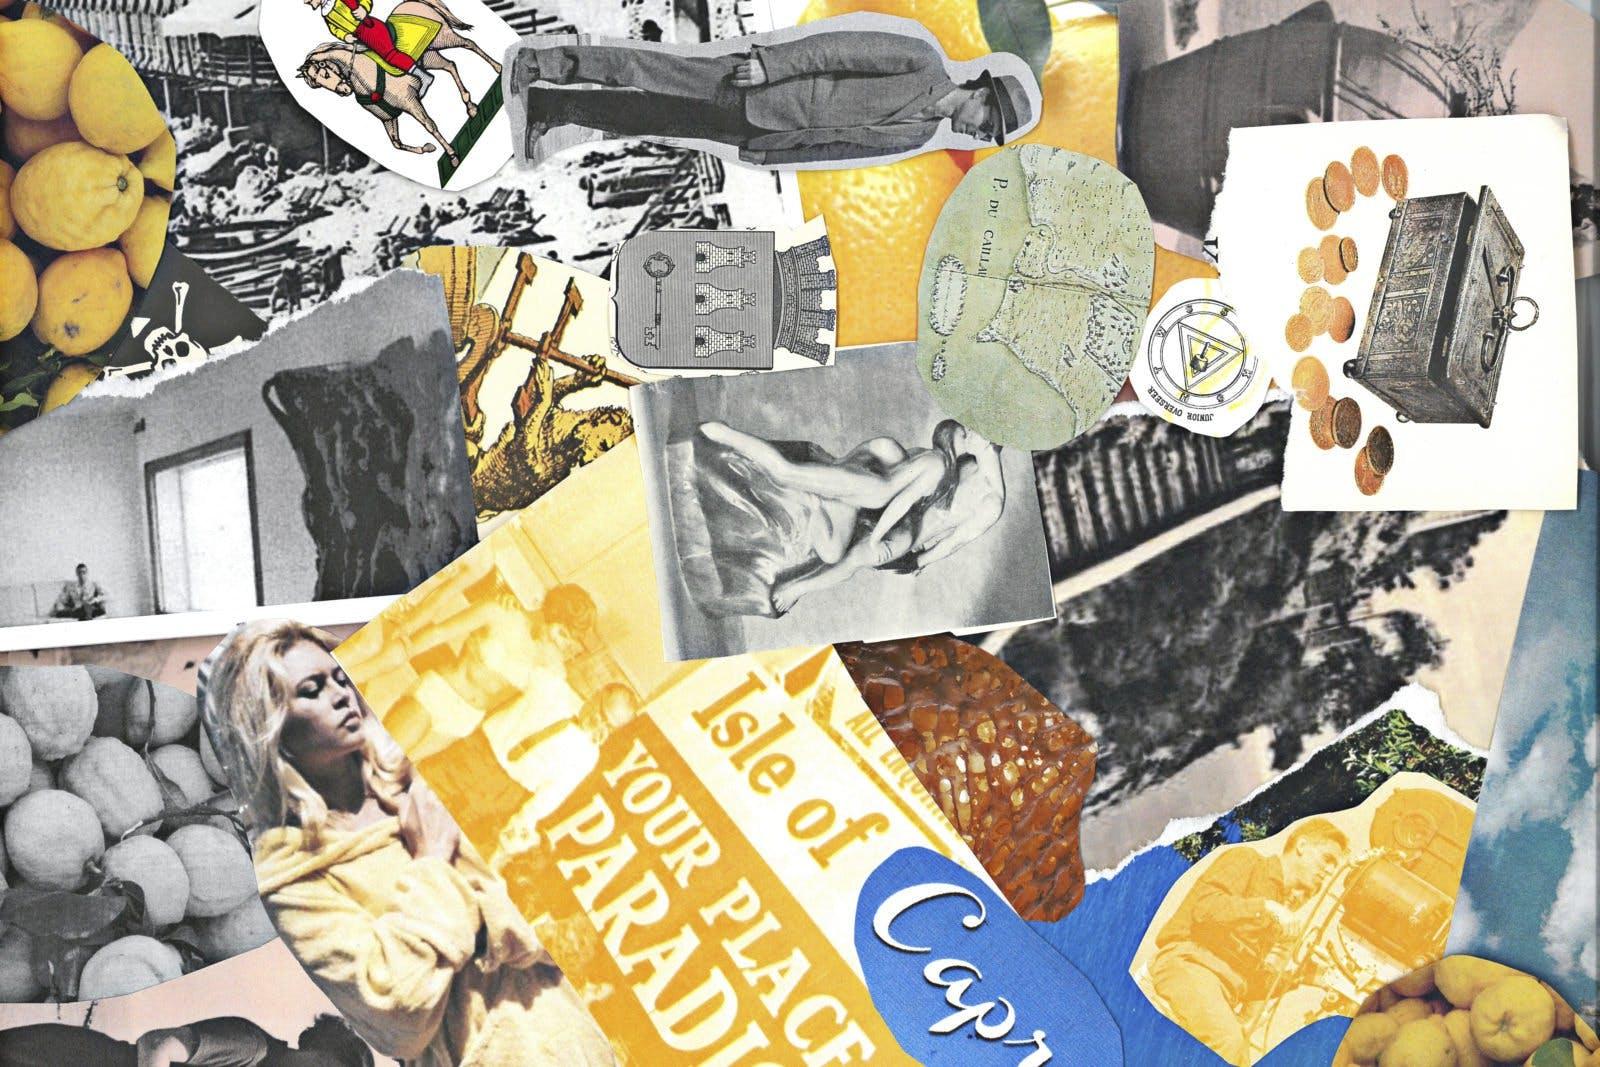 19-69-parfums-article-03